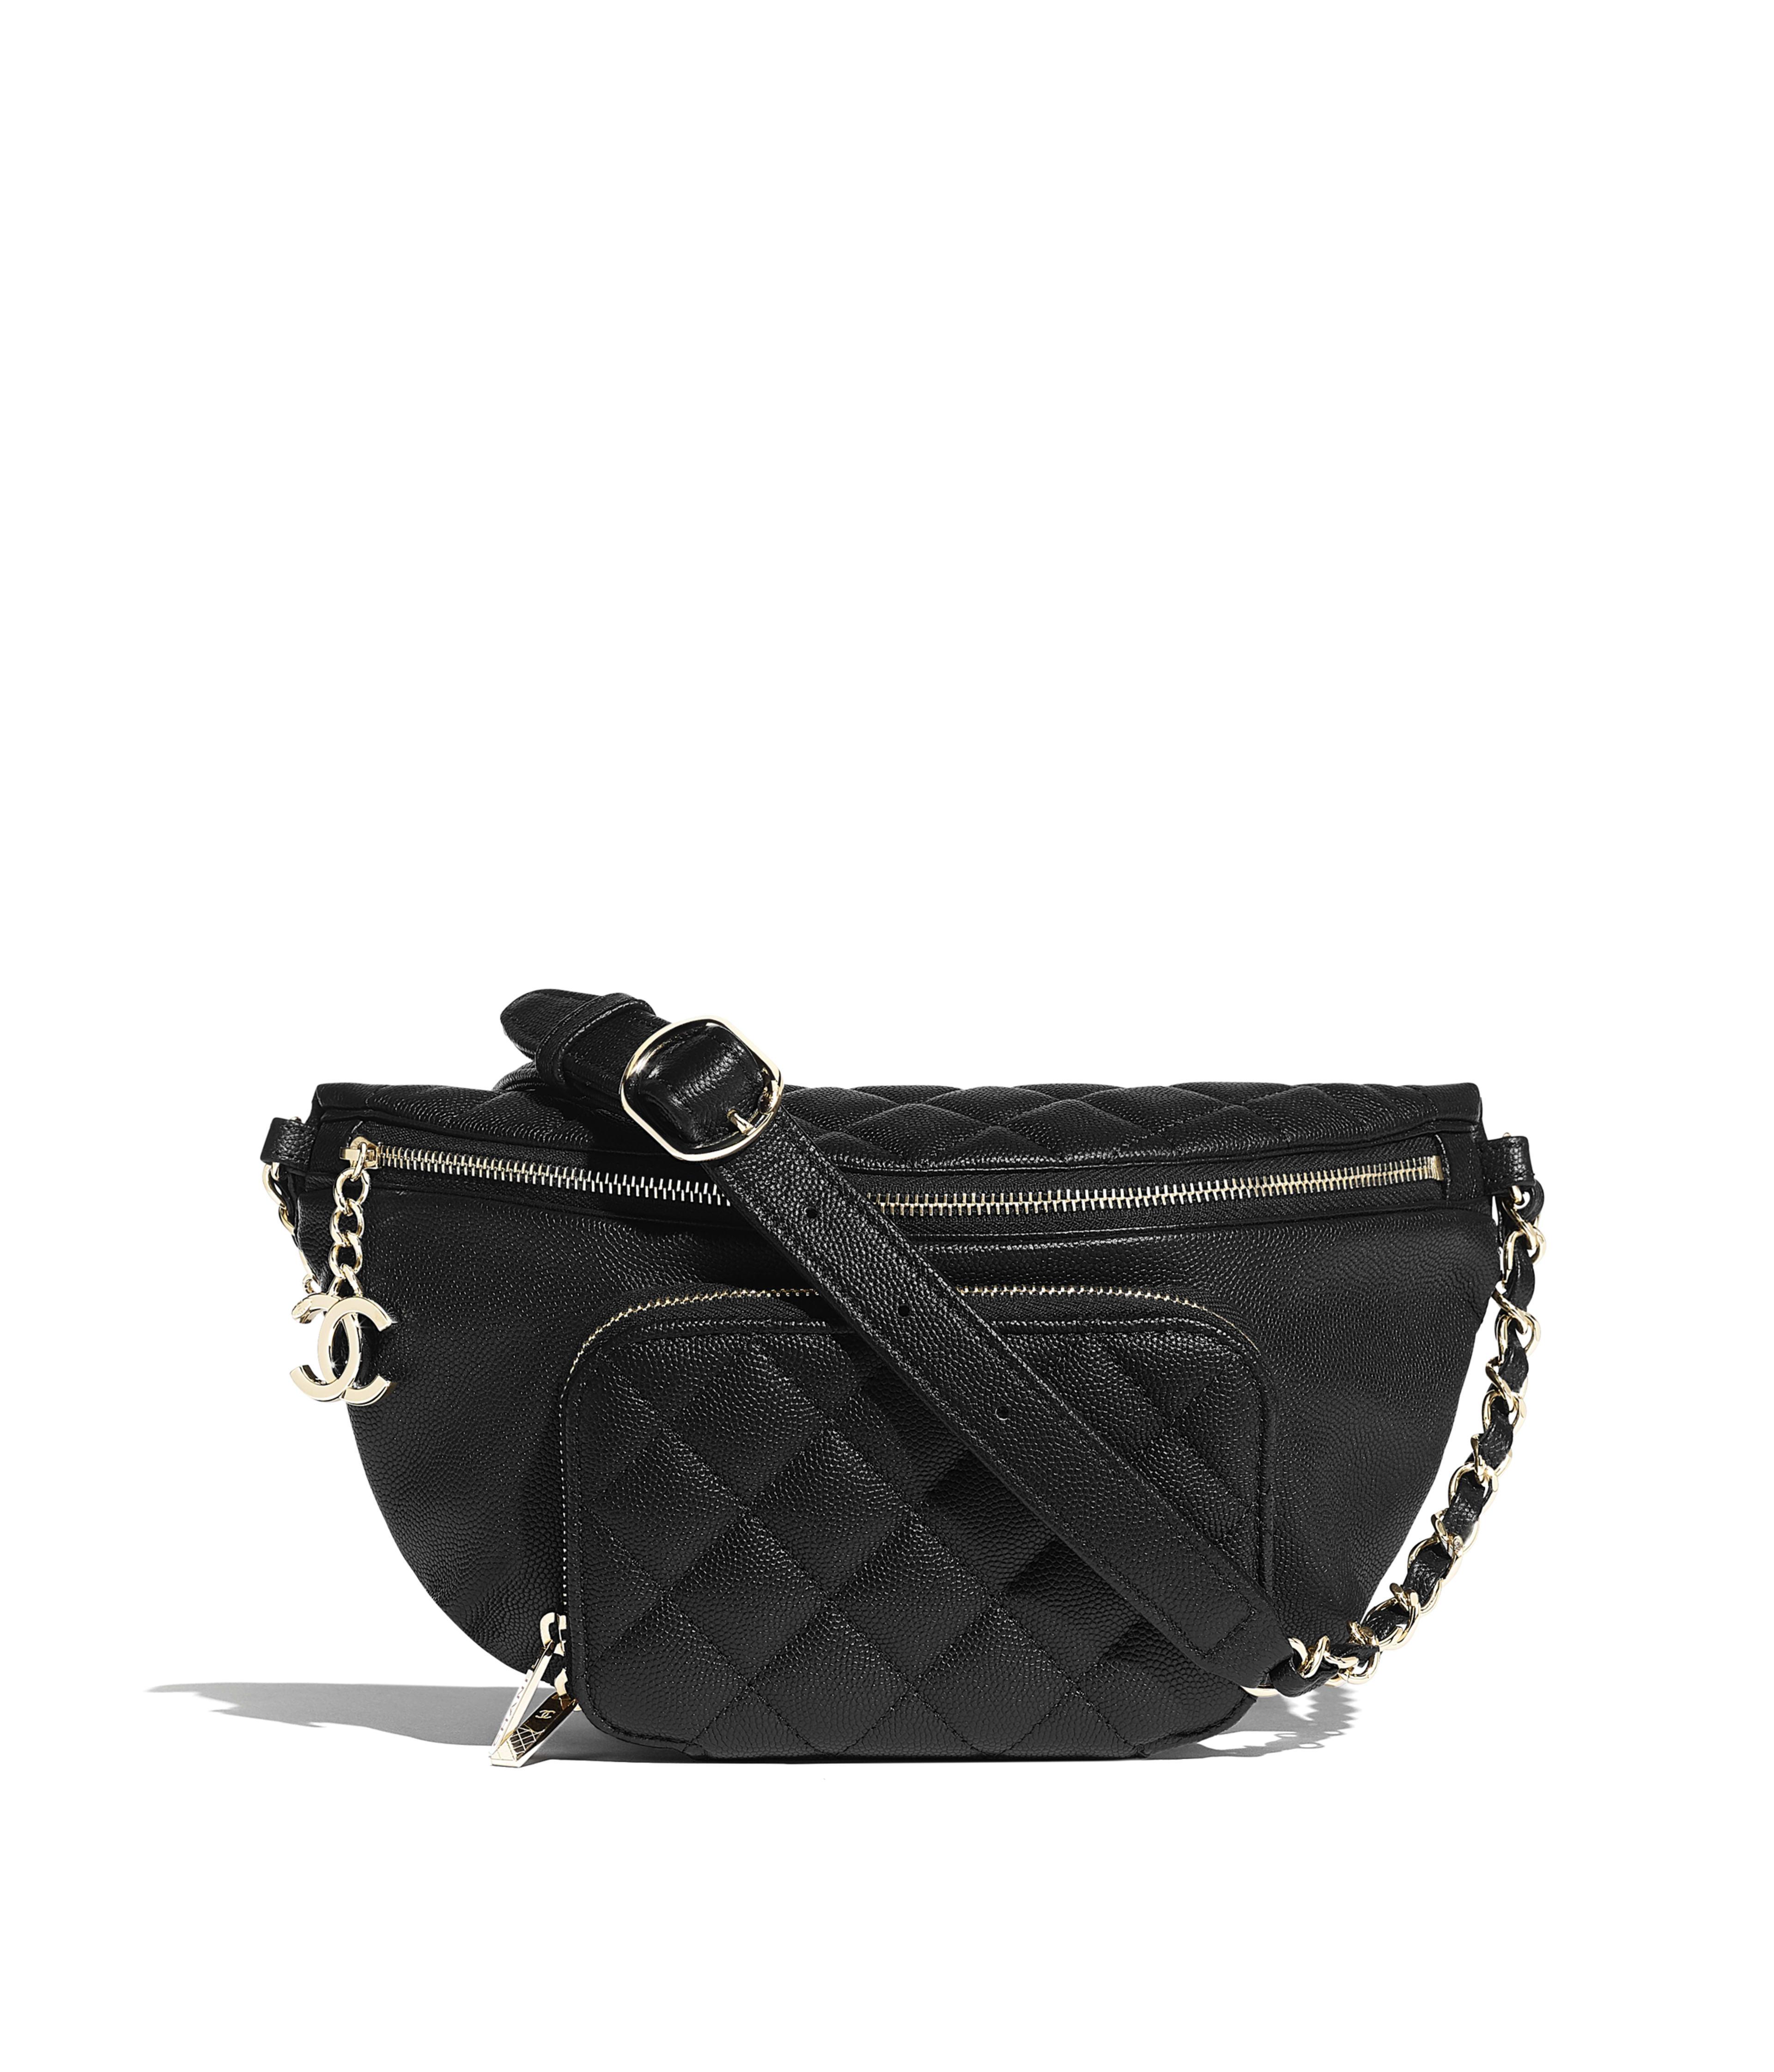 2fcf288ba8f2 Waist Bag Grained Calfskin & Gold-Tone Metal, Black Ref. AS0465B0009894305